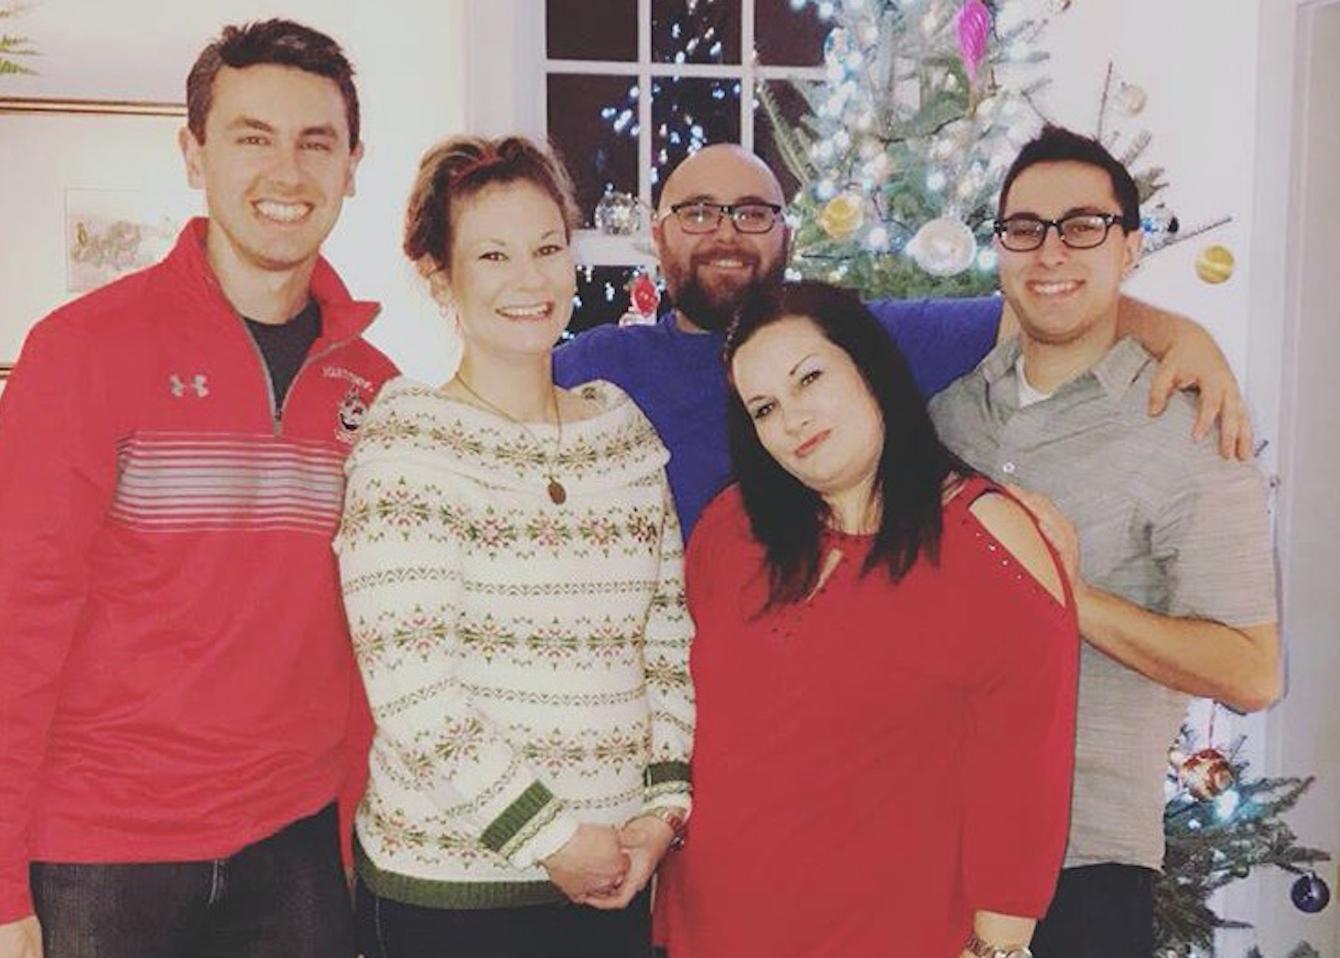 Me and my siblings at Christmas